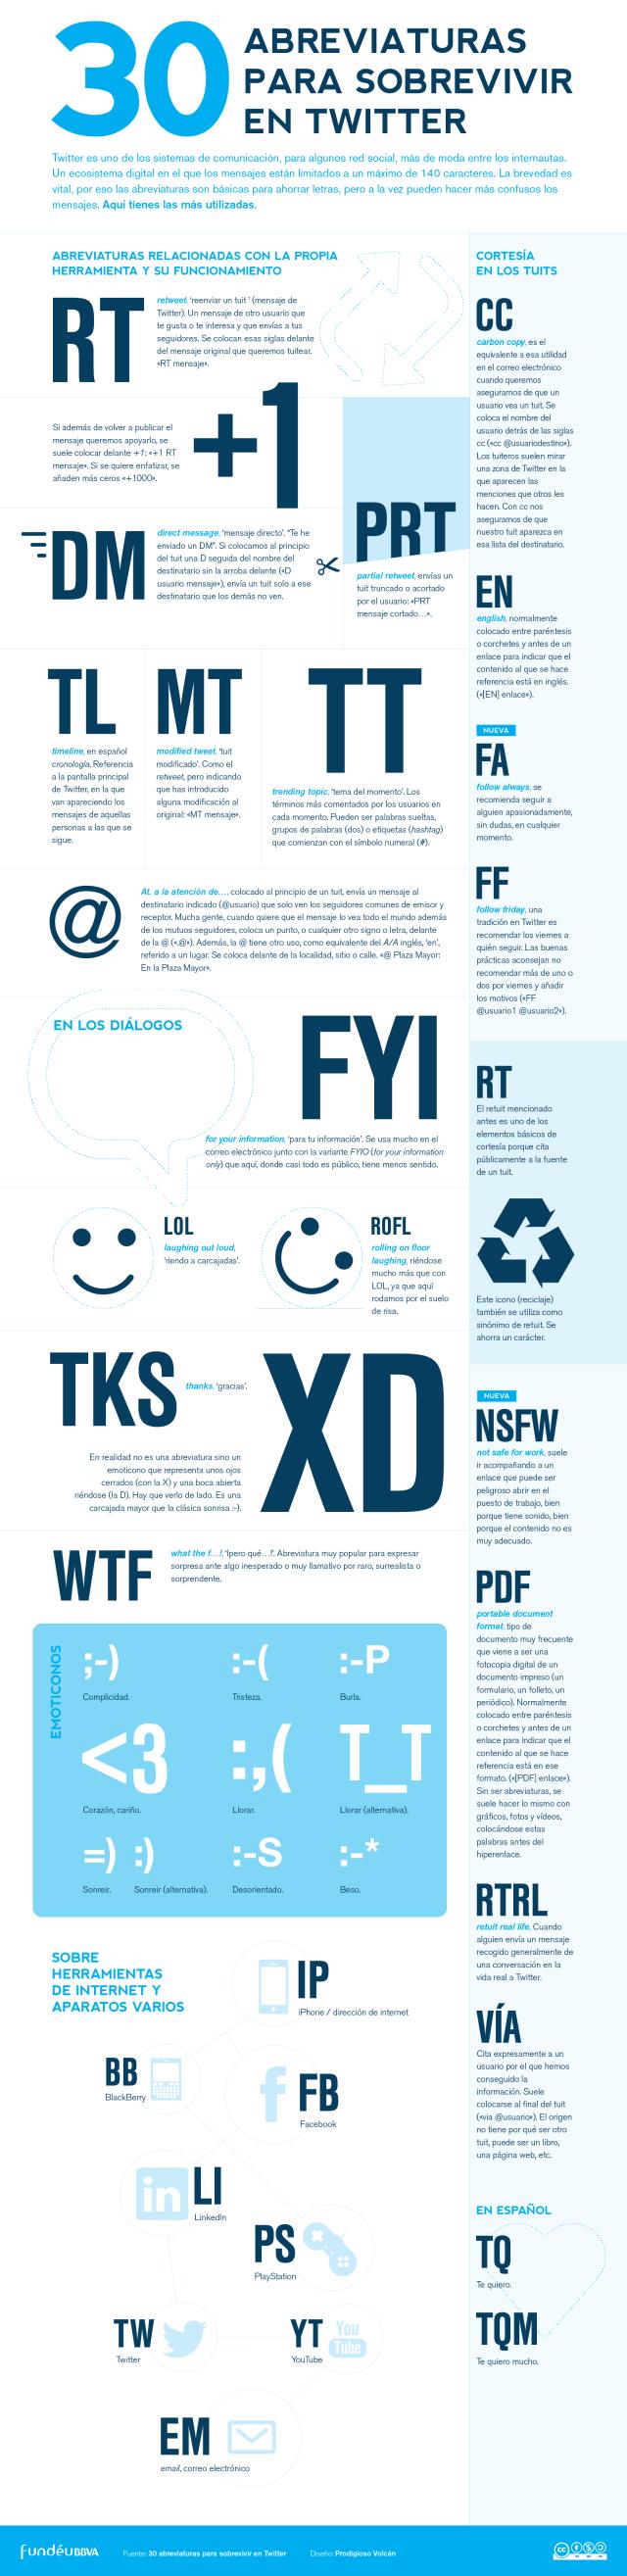 30 abreviaturas para sobrevivir en Twitter